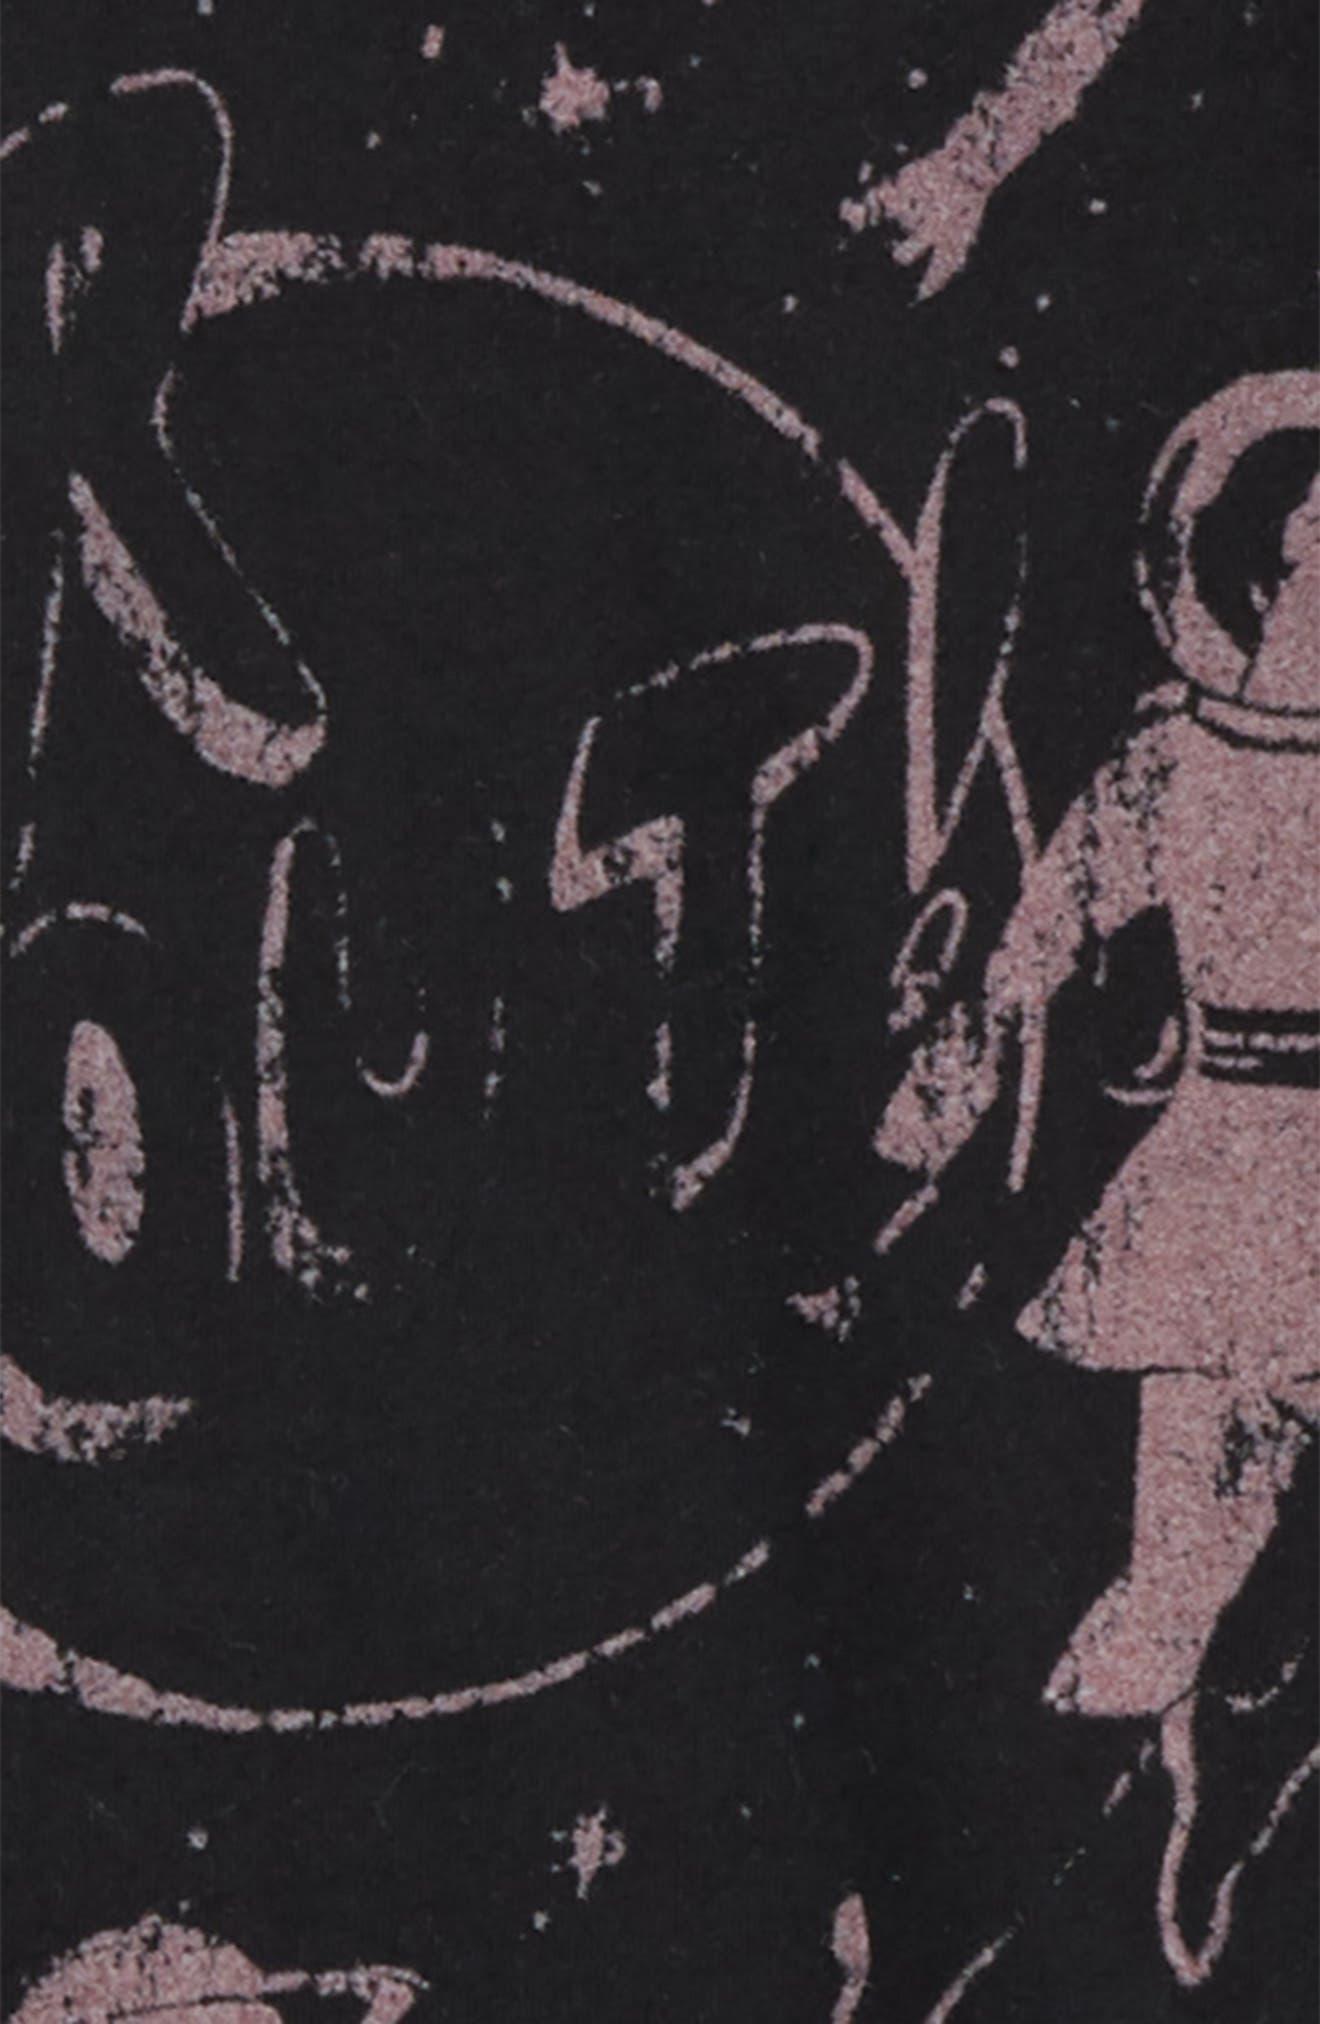 Graphic Cotton Tee,                             Alternate thumbnail 2, color,                             001